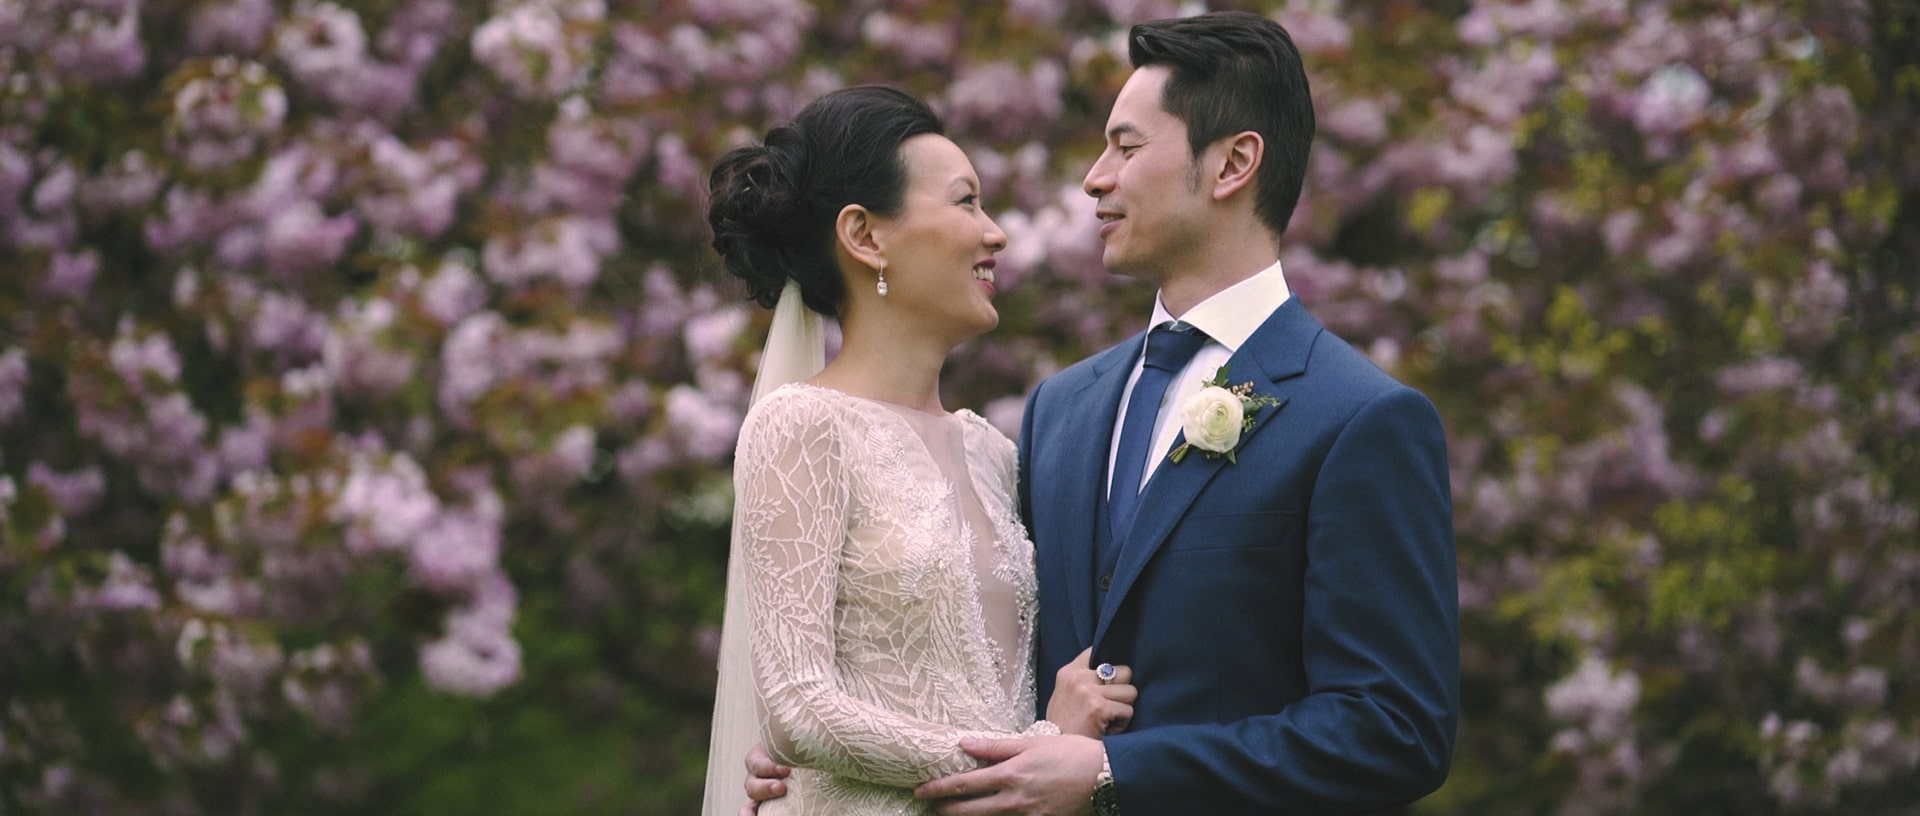 Chinese wedding at Babington House